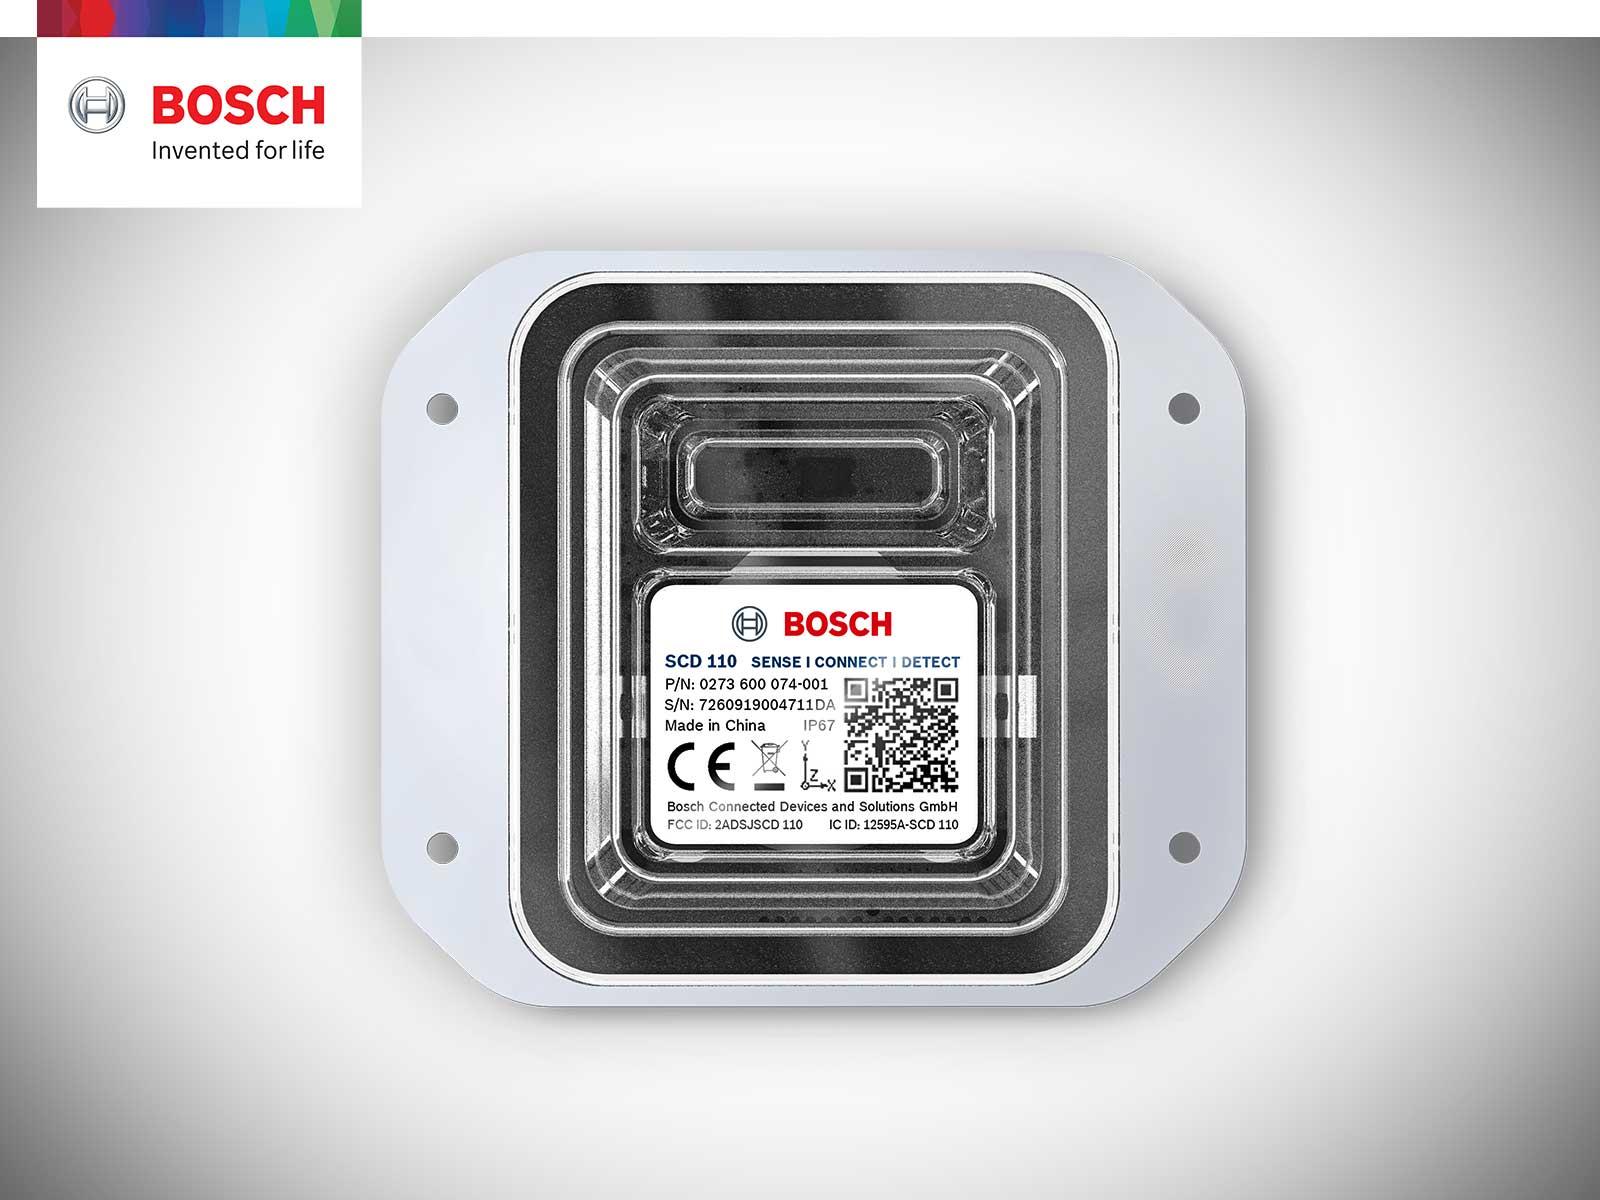 SCD - Sense, Connect, Detect - Bluetooth Sensor Bosch